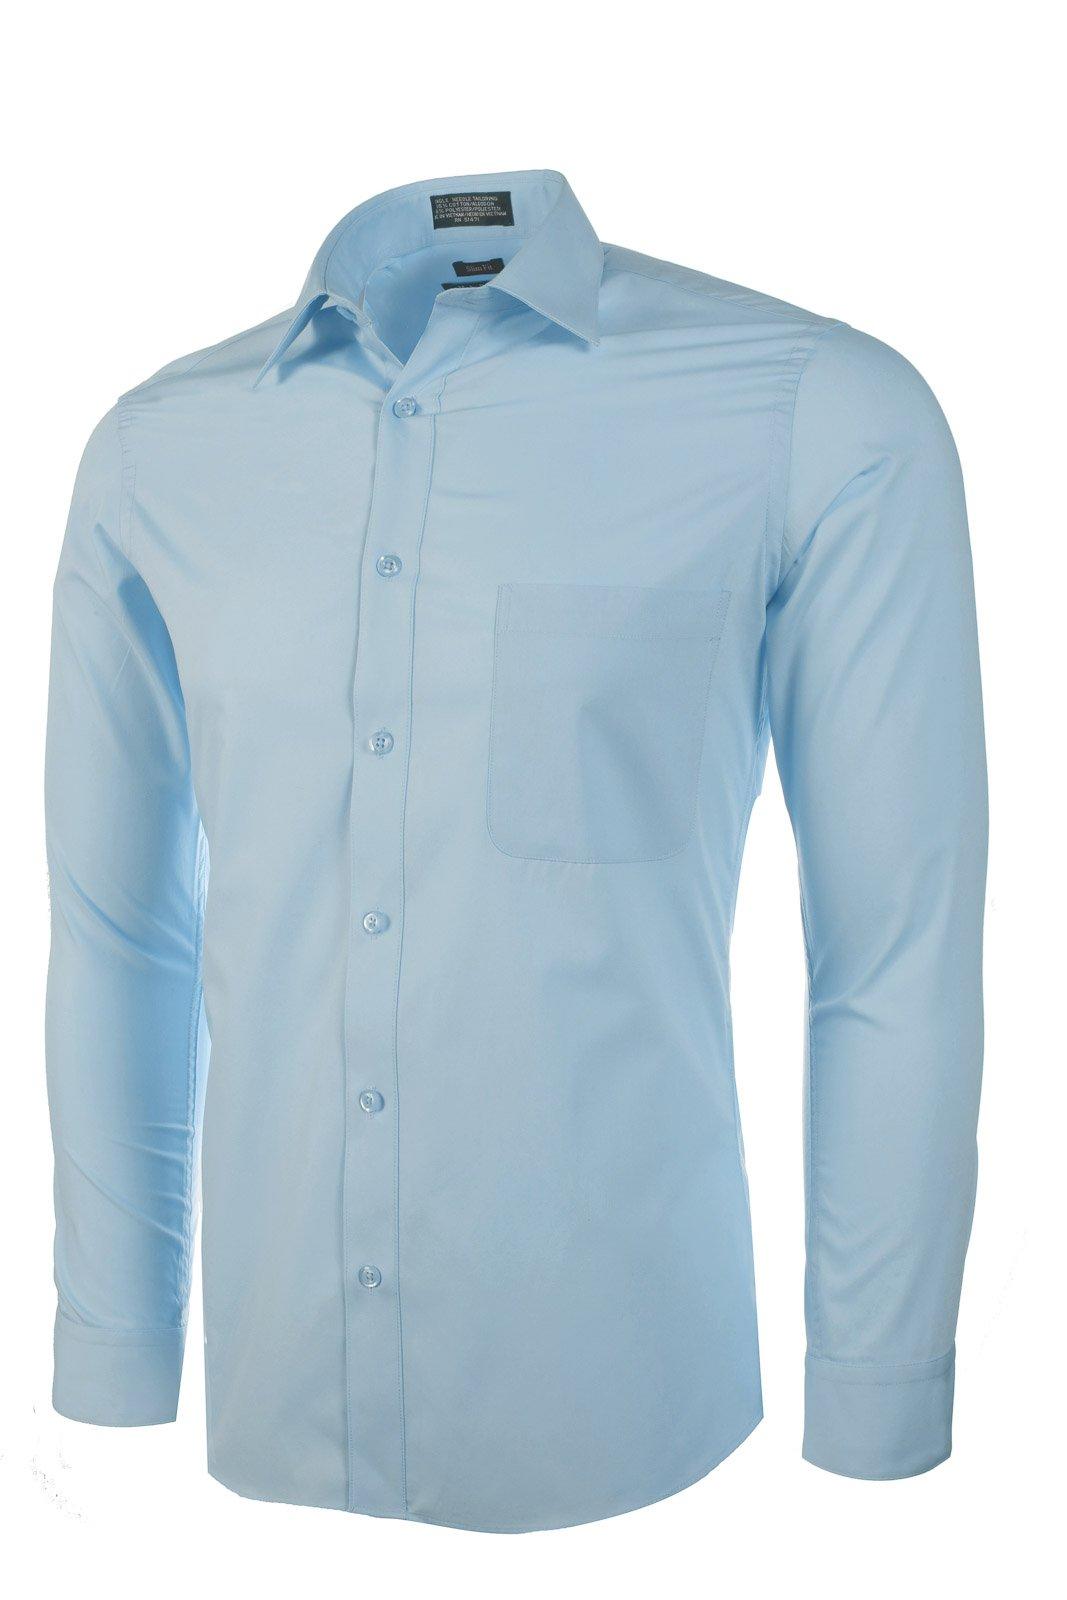 Marquis Men's Slim Fit Dress Shirt - Light Blue, Medium 15-15.5 Neck 34/35 Sleeve